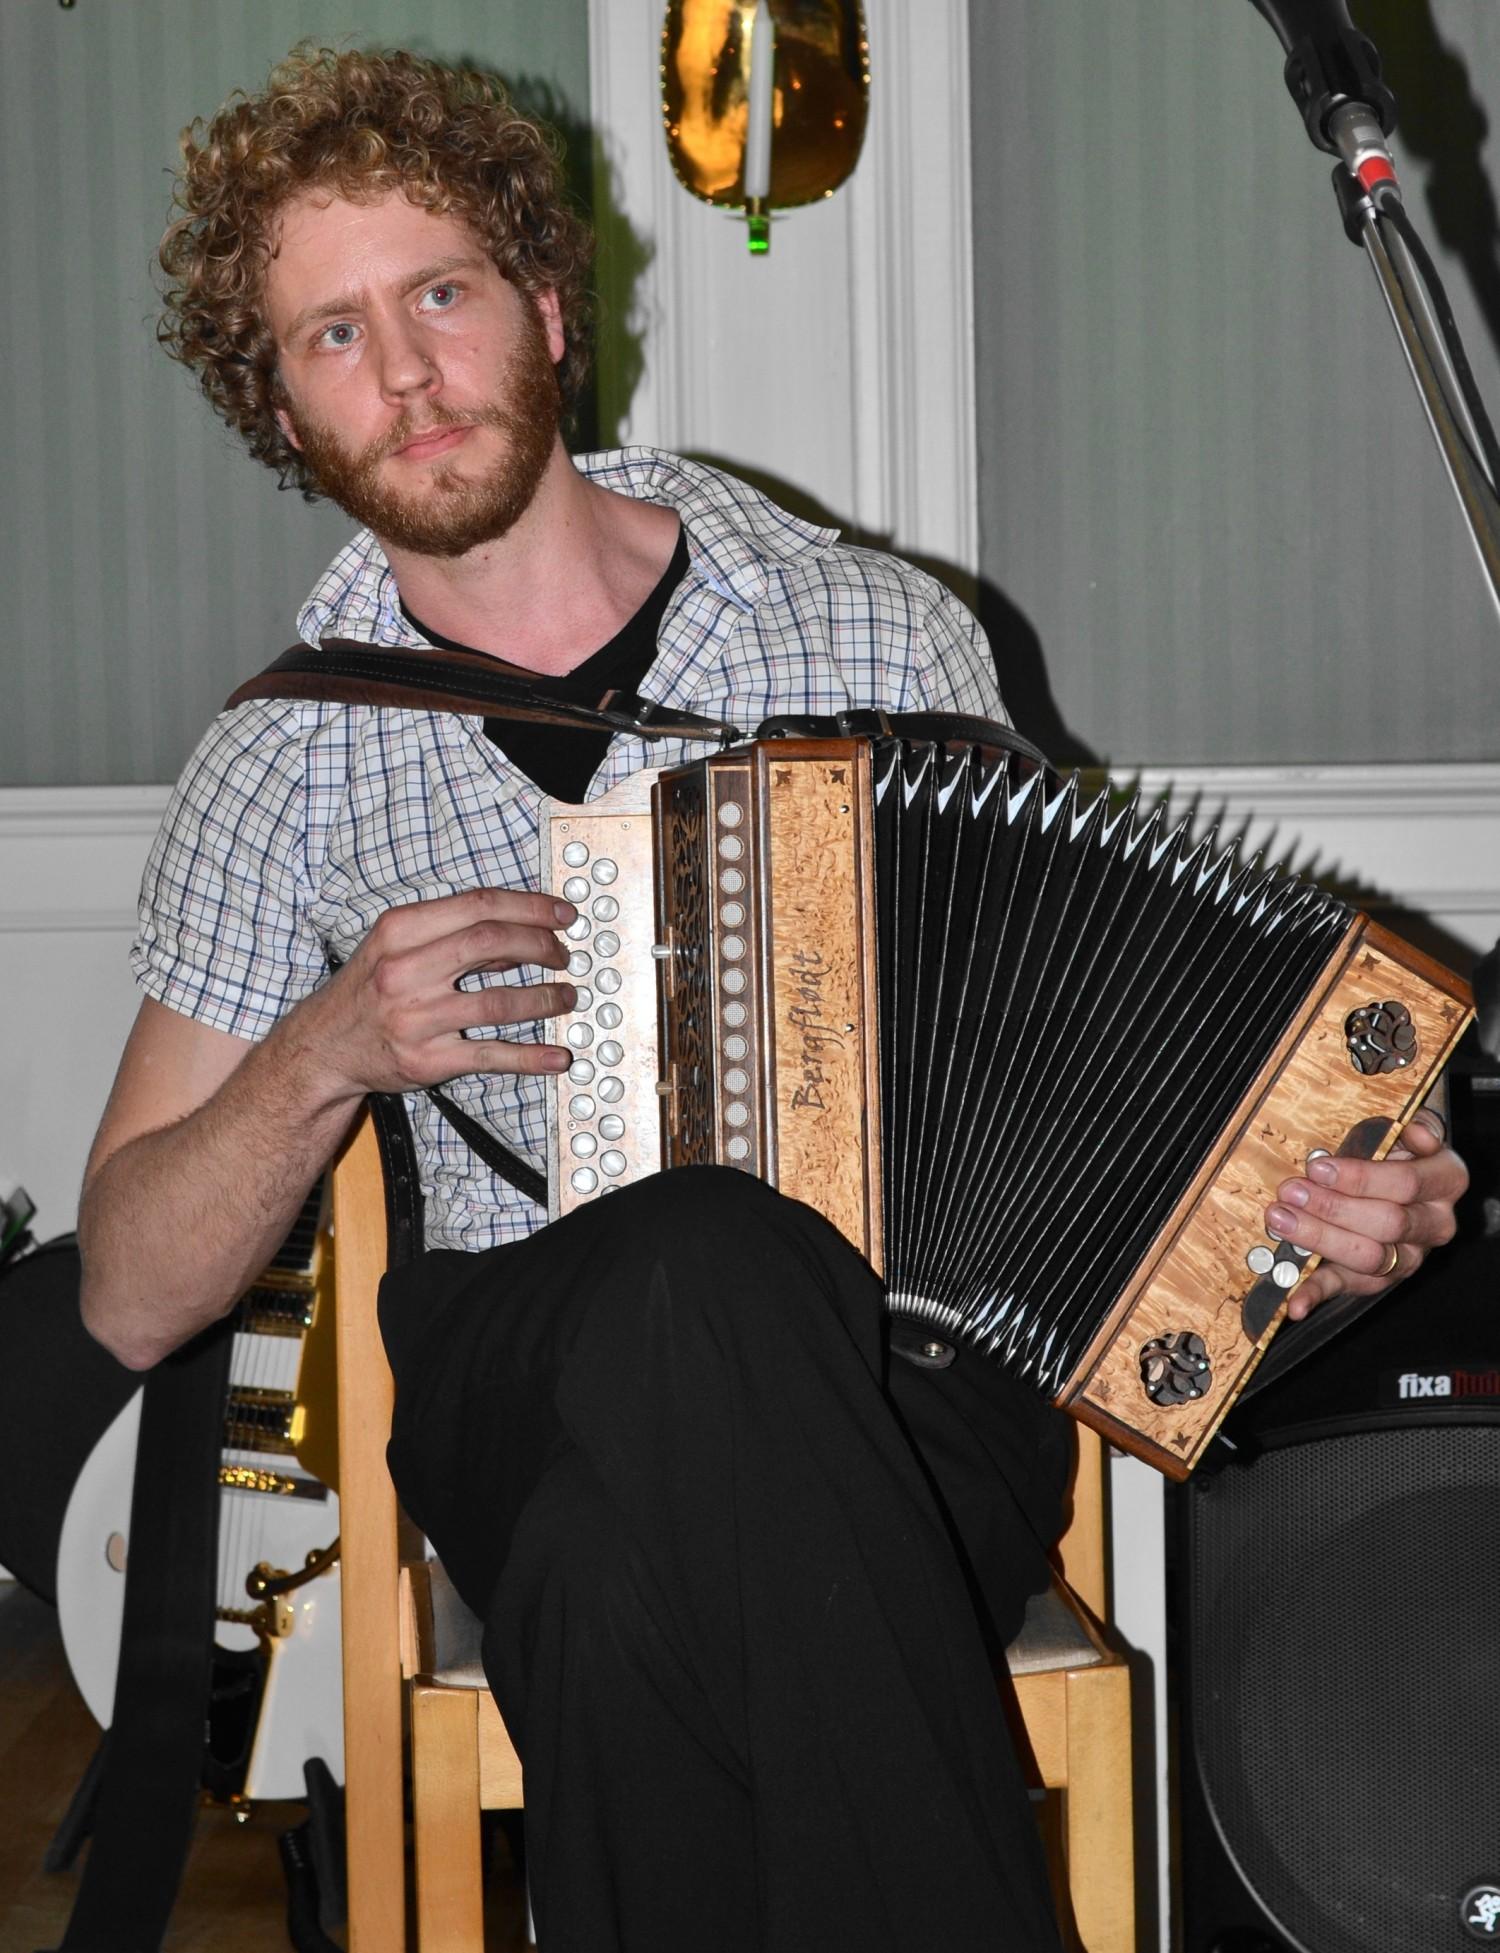 Mattias Nyström